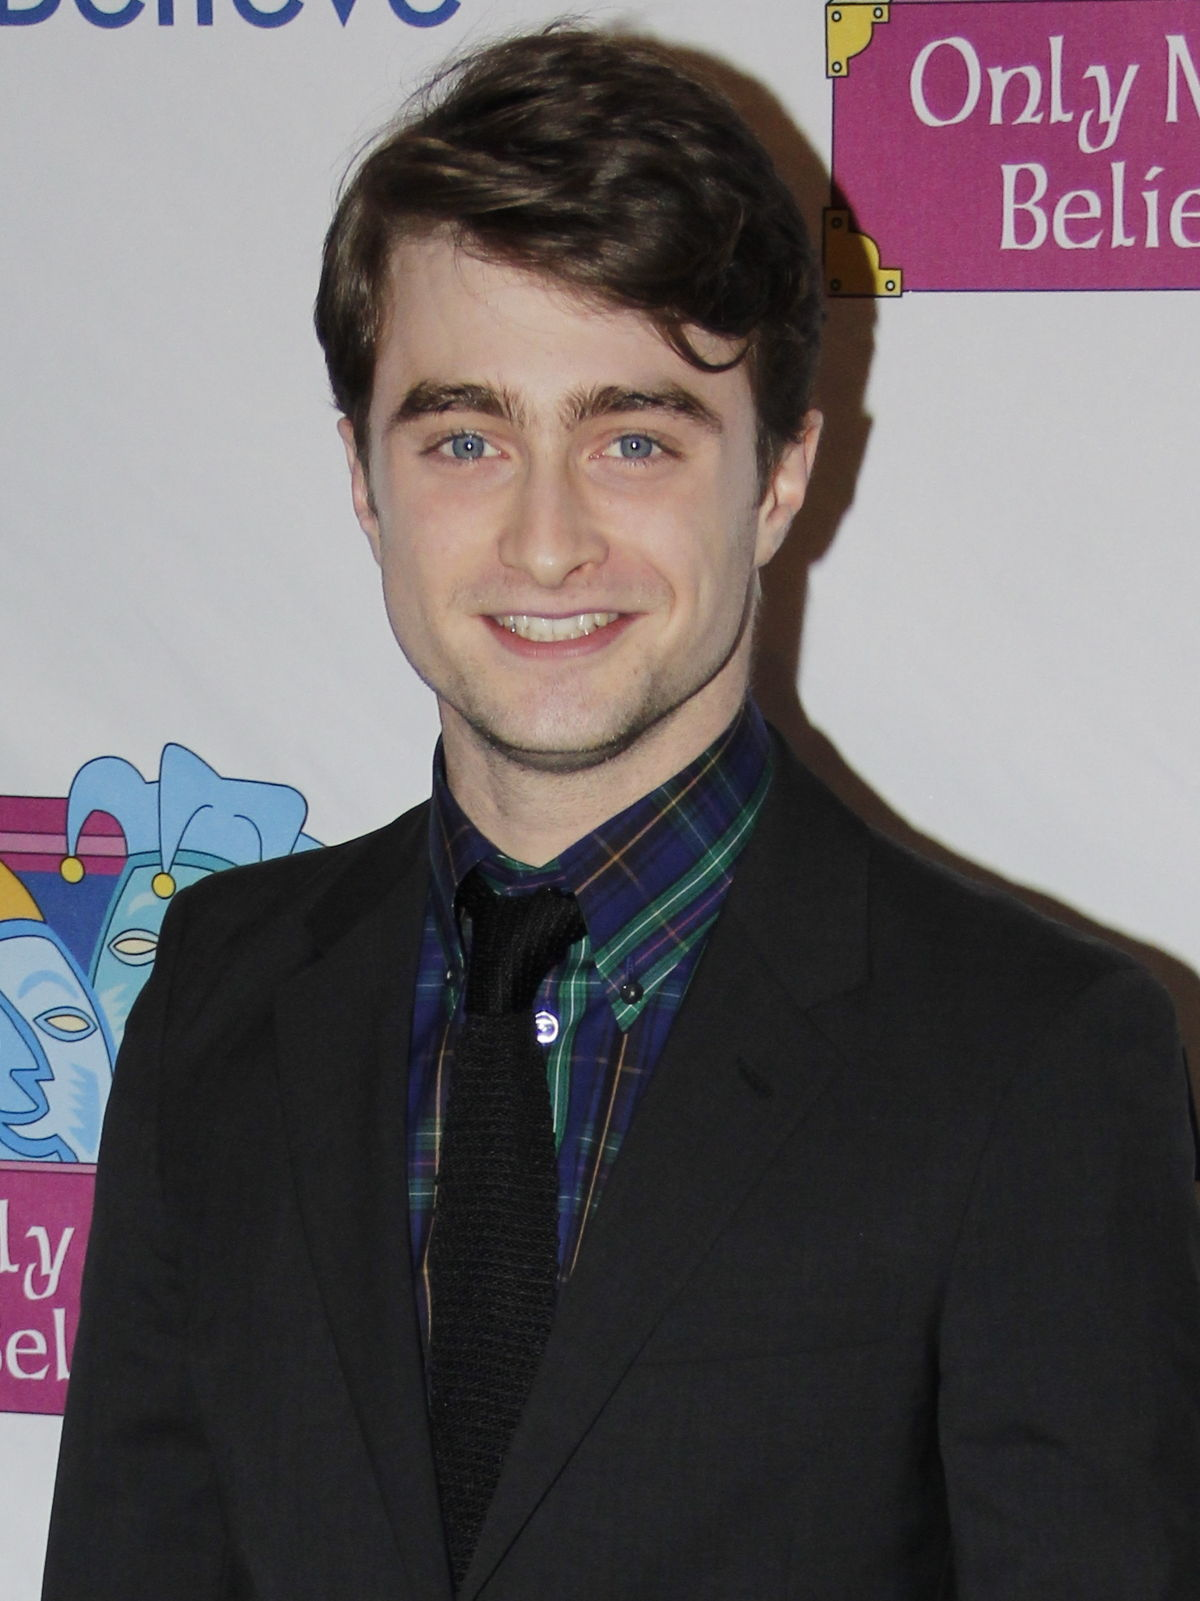 Daniel Radcliffe - Wikipedia Daniel Radcliffe